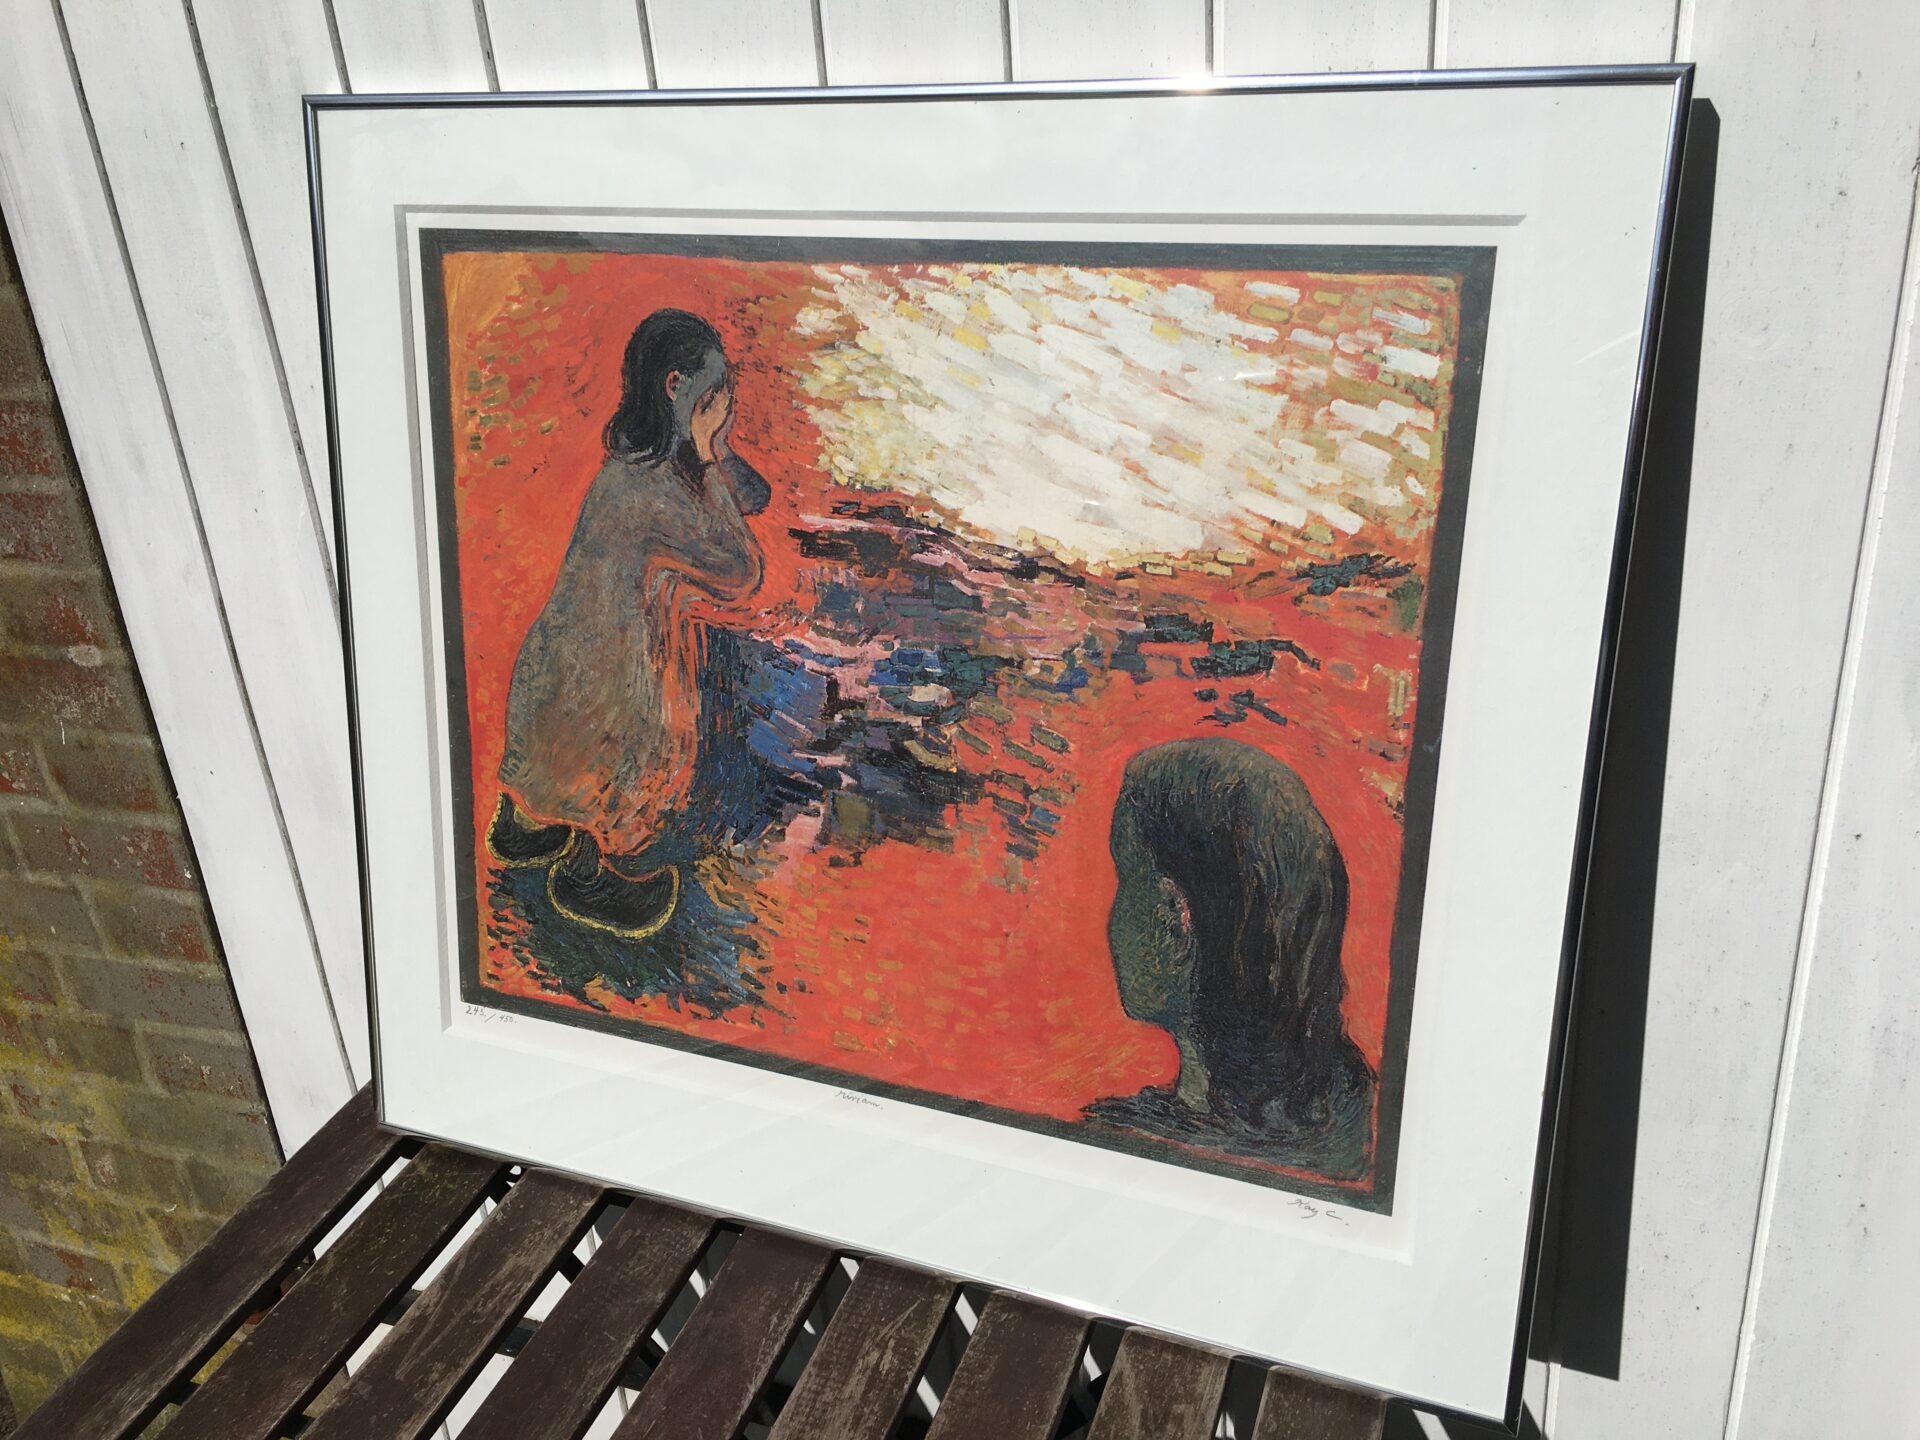 Kay Christensen (Kay C) litografi nr 245/450, floi indrammet med passpartout, 66x74 cm, pris 400 kr